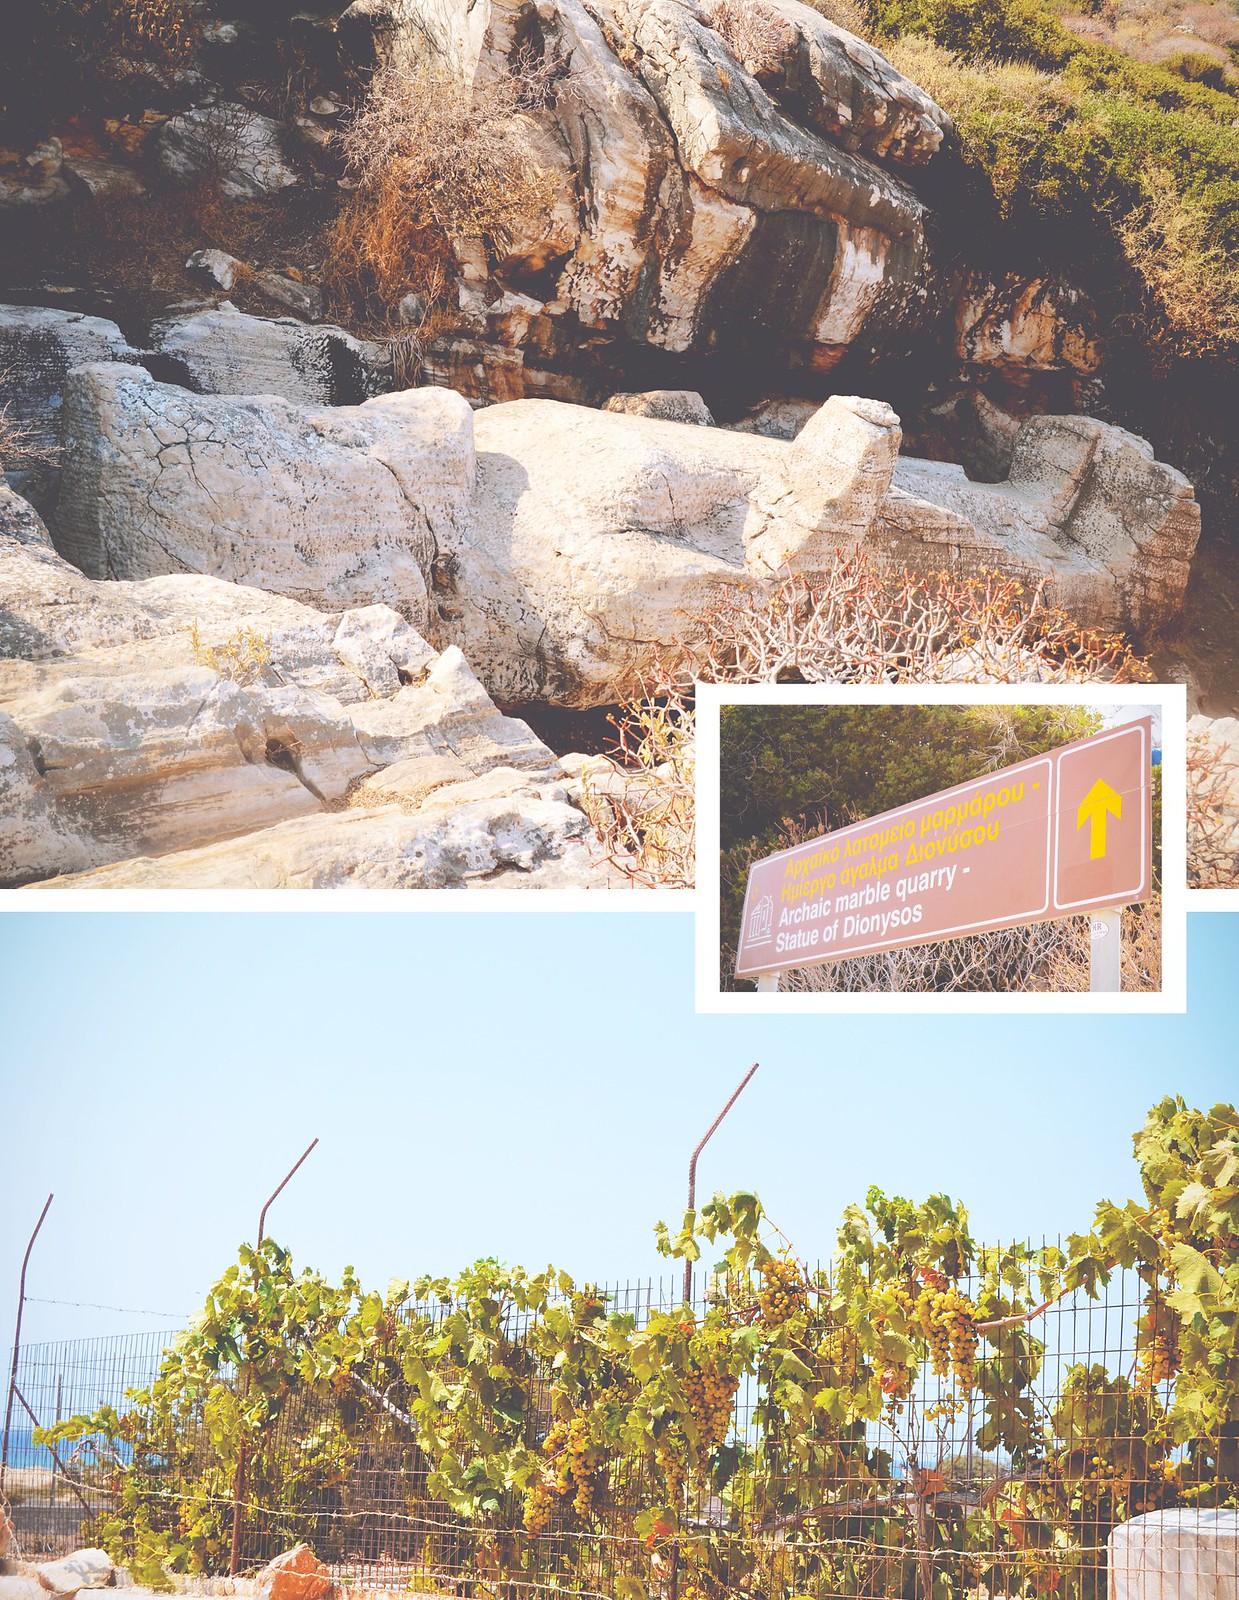 The statue of Wine God Dionysos on the island of Naxos, Greece   via It's Travel O'Clock